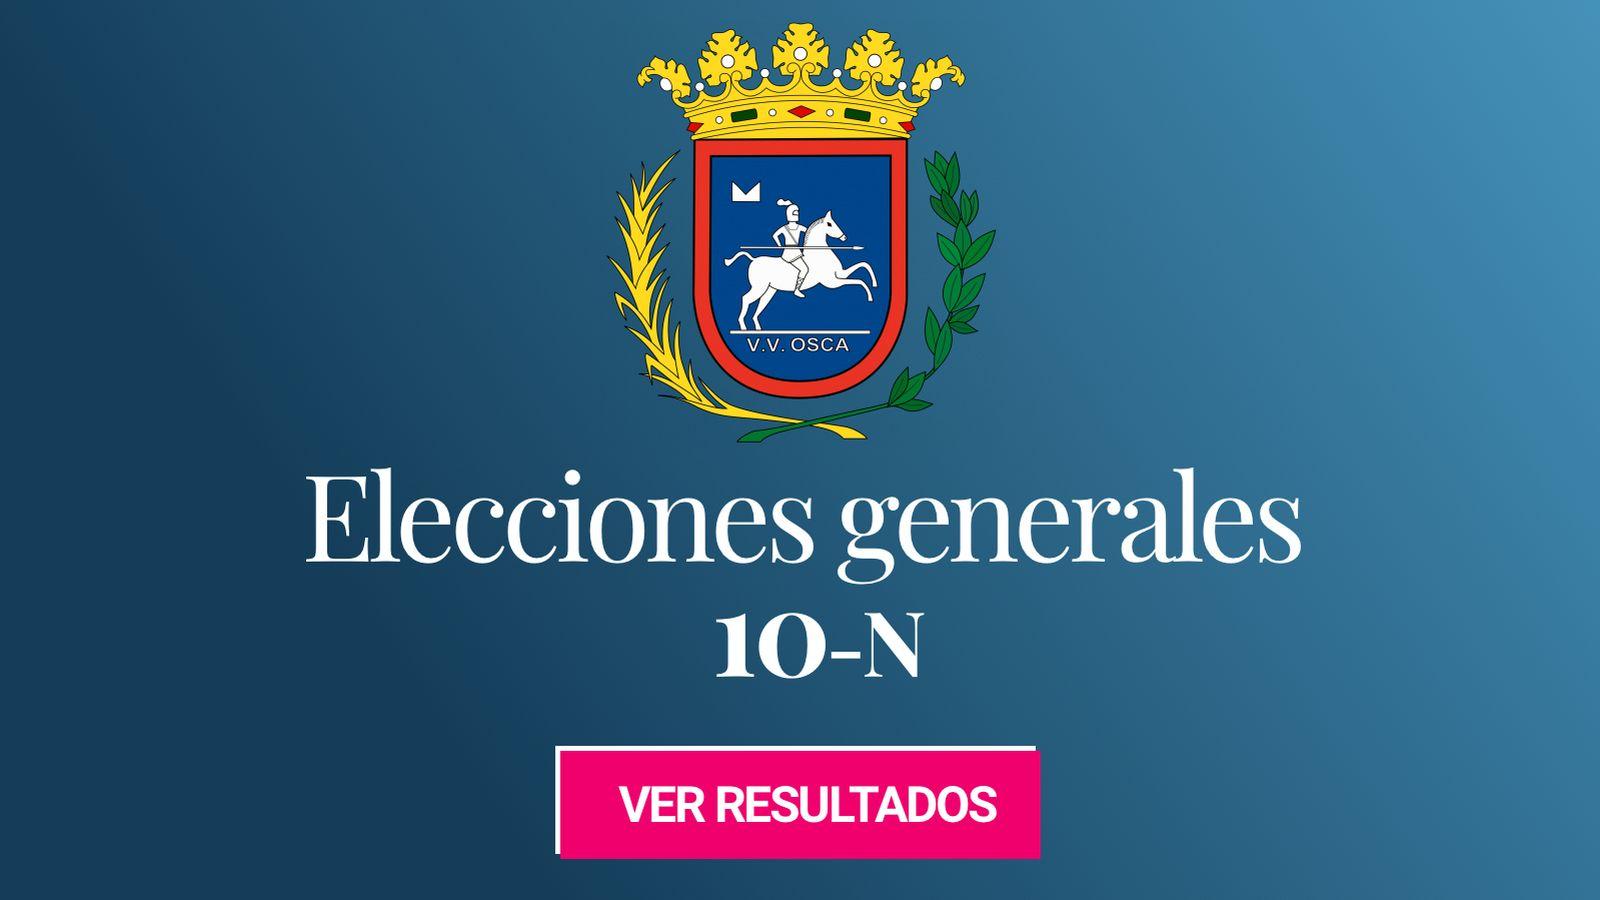 Foto: Elecciones generales 2019 en Huesca. (C.C./EC)